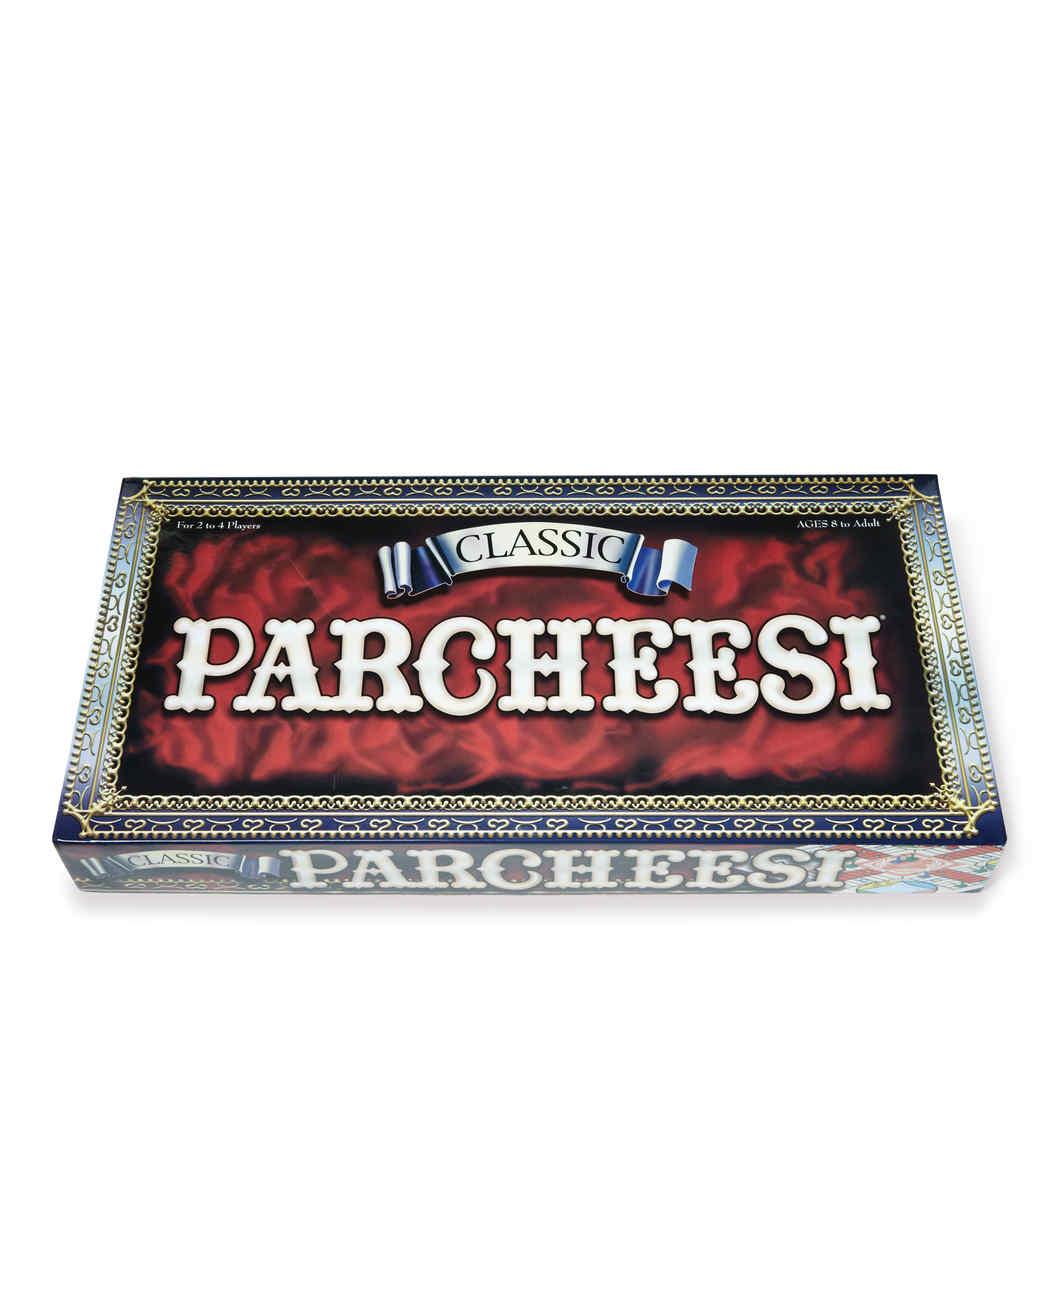 games-parcheesi-0811mld107420.jpg